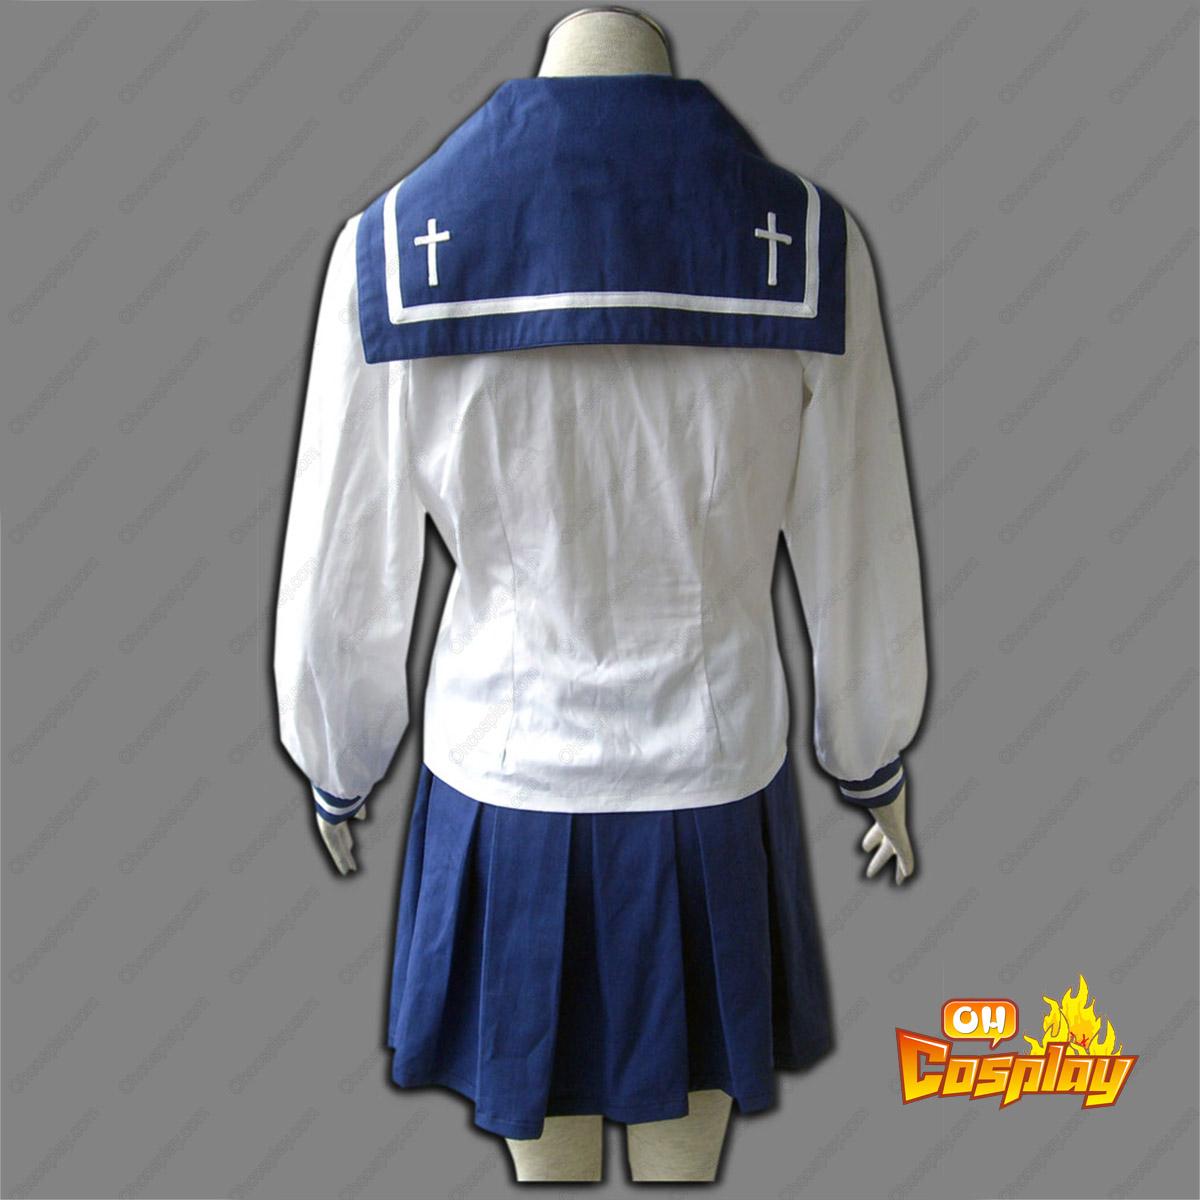 Buso Renkin Tokiko Tsumura Sailor Cosplay Costumes Deluxe Edition